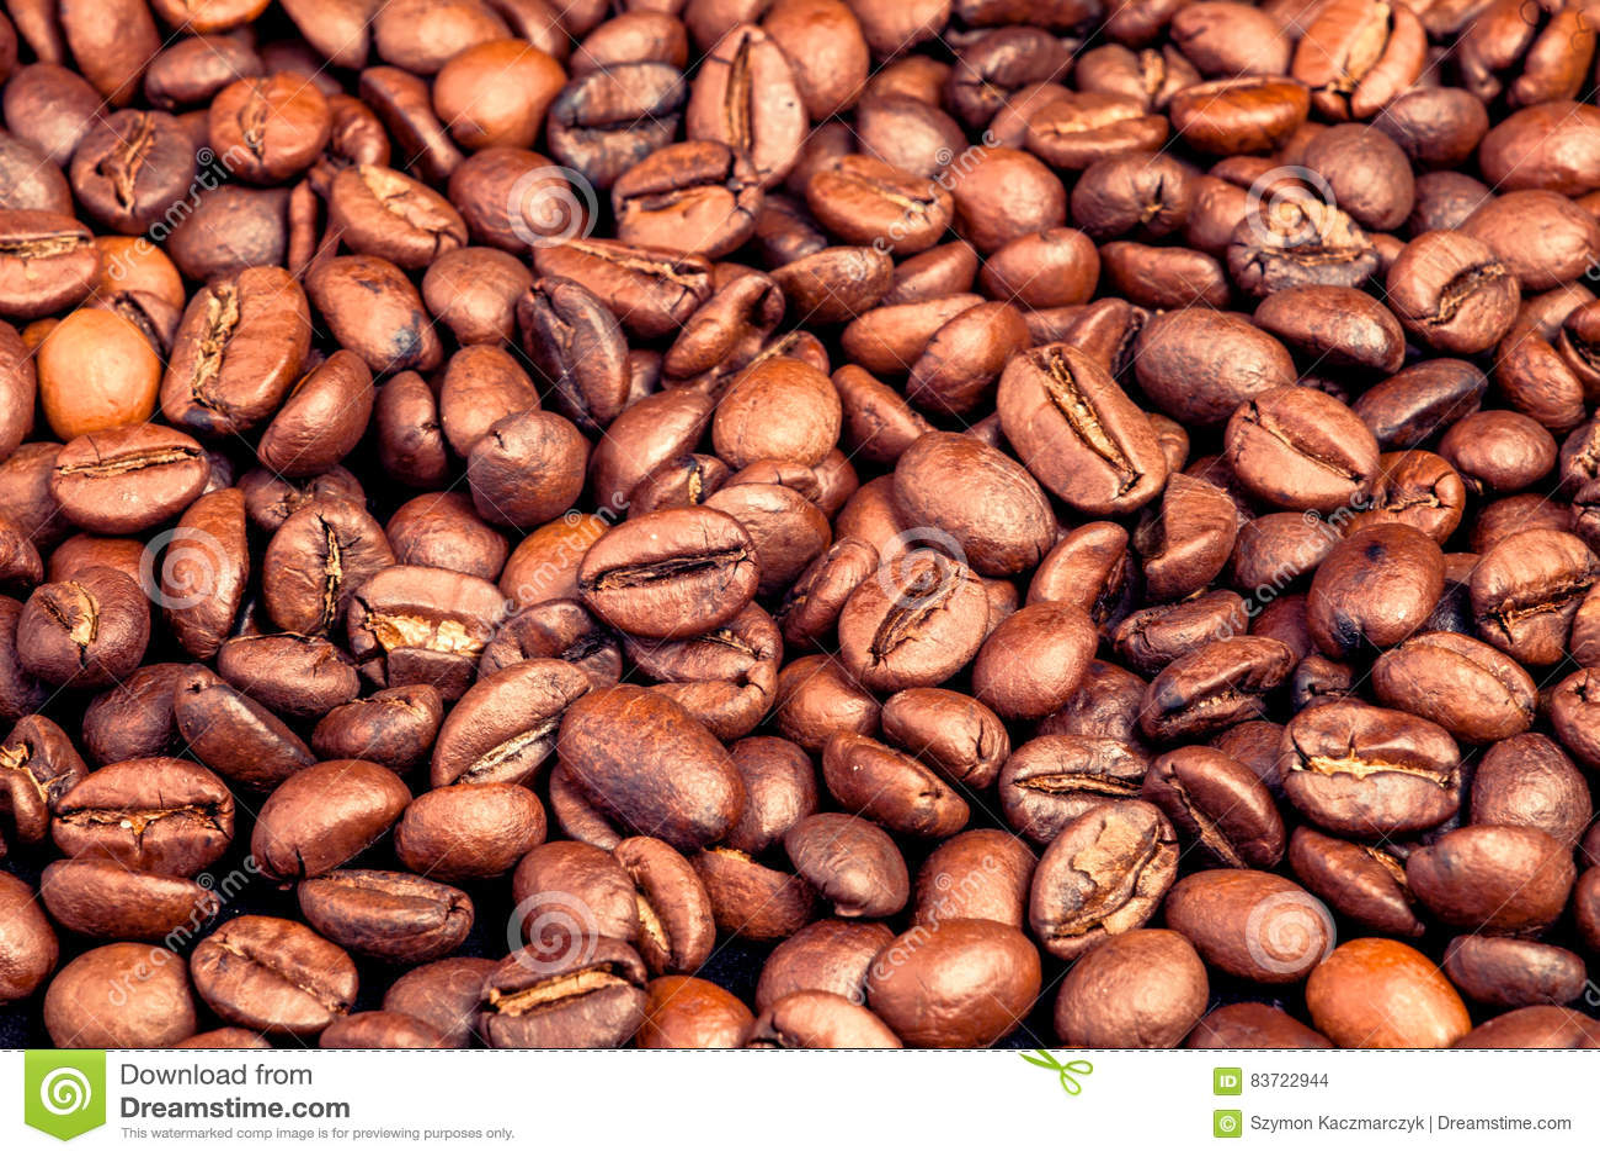 Many Macro Coffe Beans Closeup On Coffee Background. Stock Photo